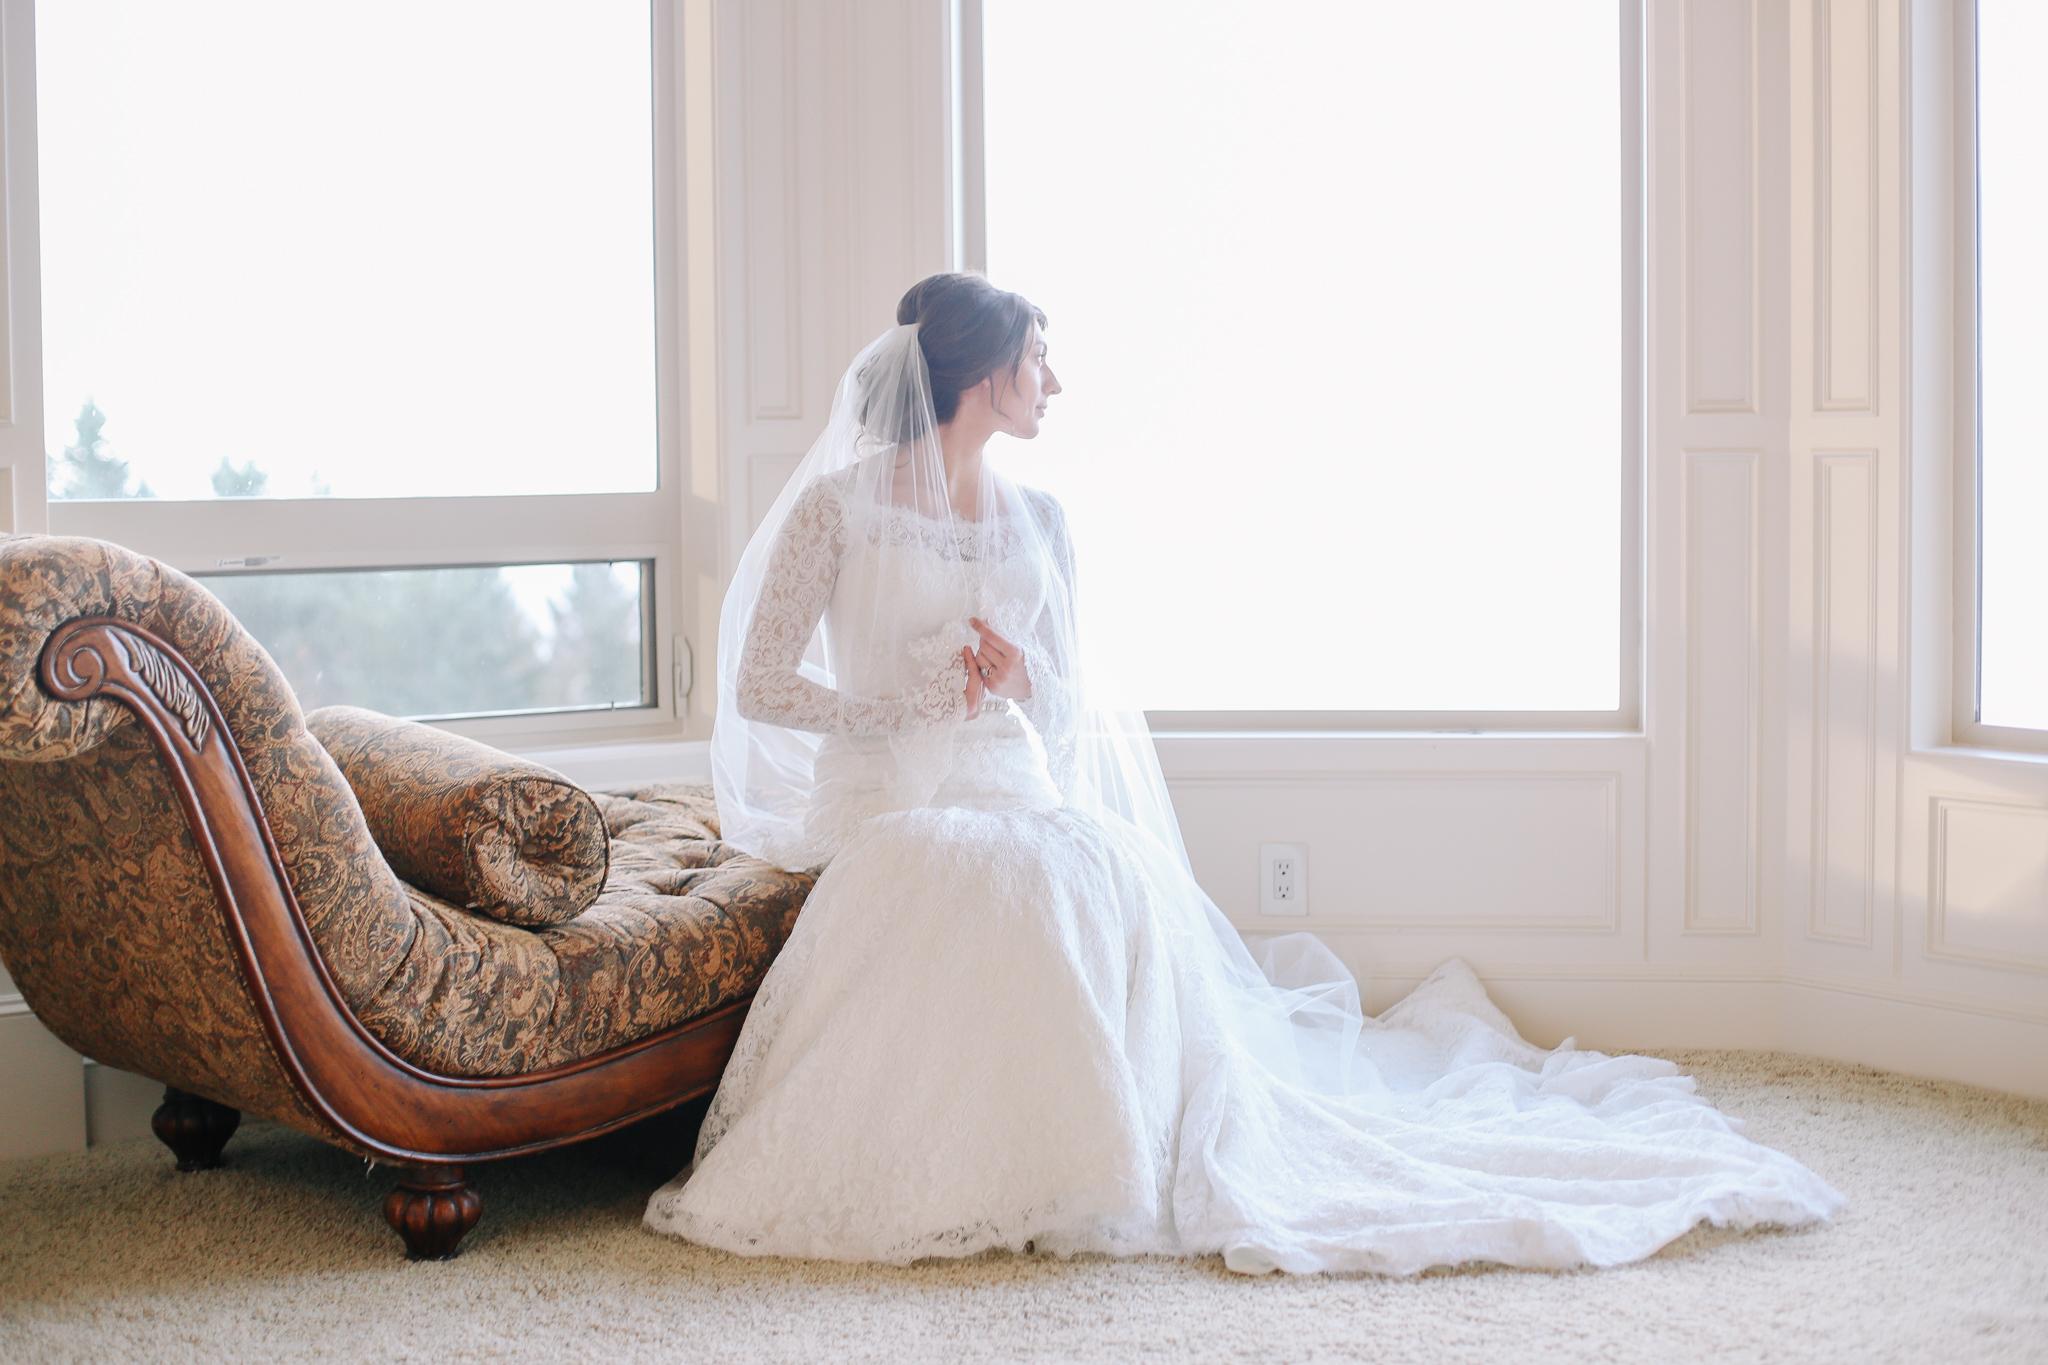 Manu and Laura - Portland Wedding Photographer - 12.jpg